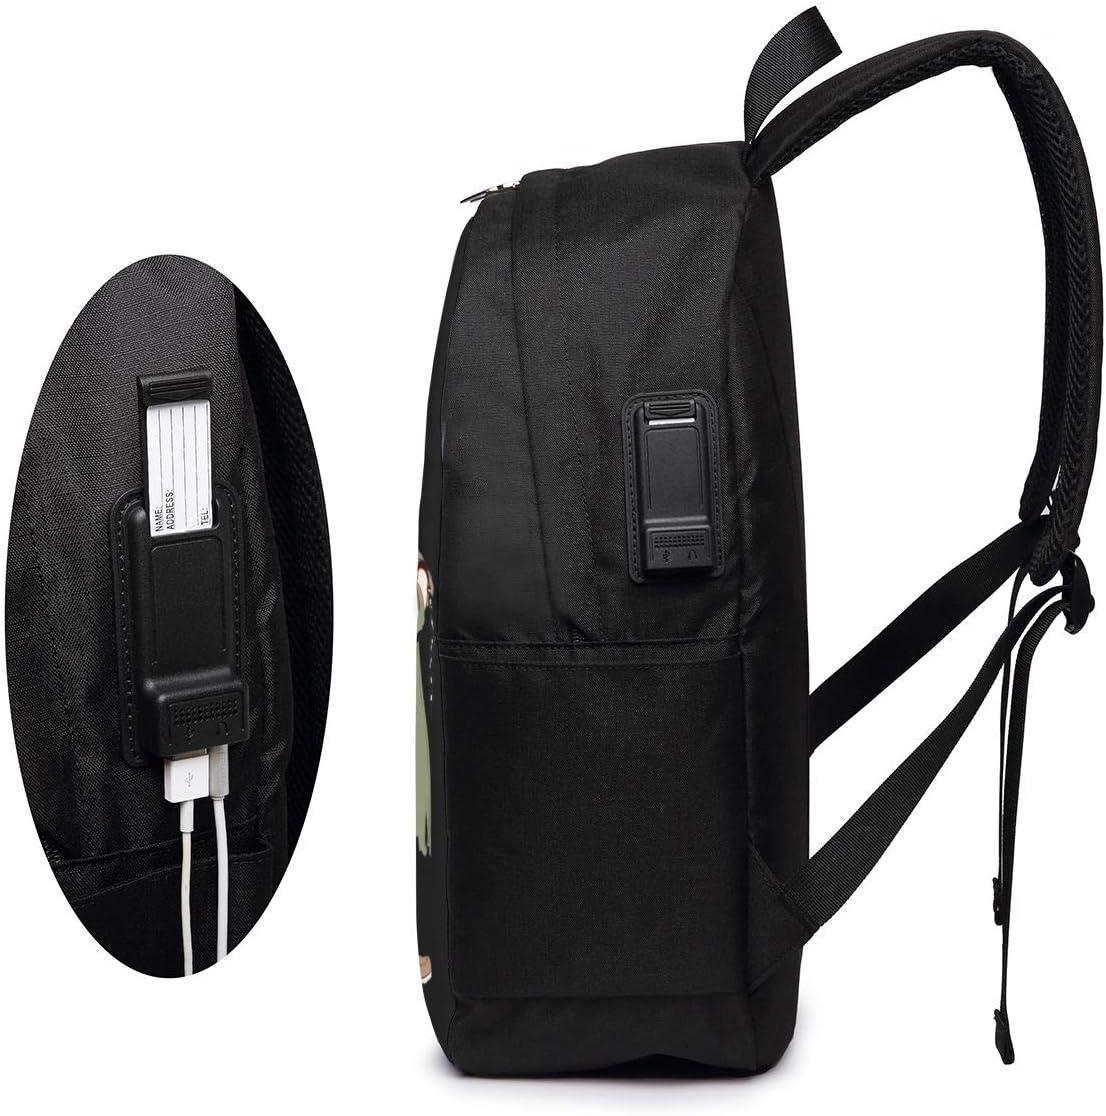 My Hero Academia Halloween 3D Animation USB Backpack School Bag School Bookbag Travel Bag Computer Bag